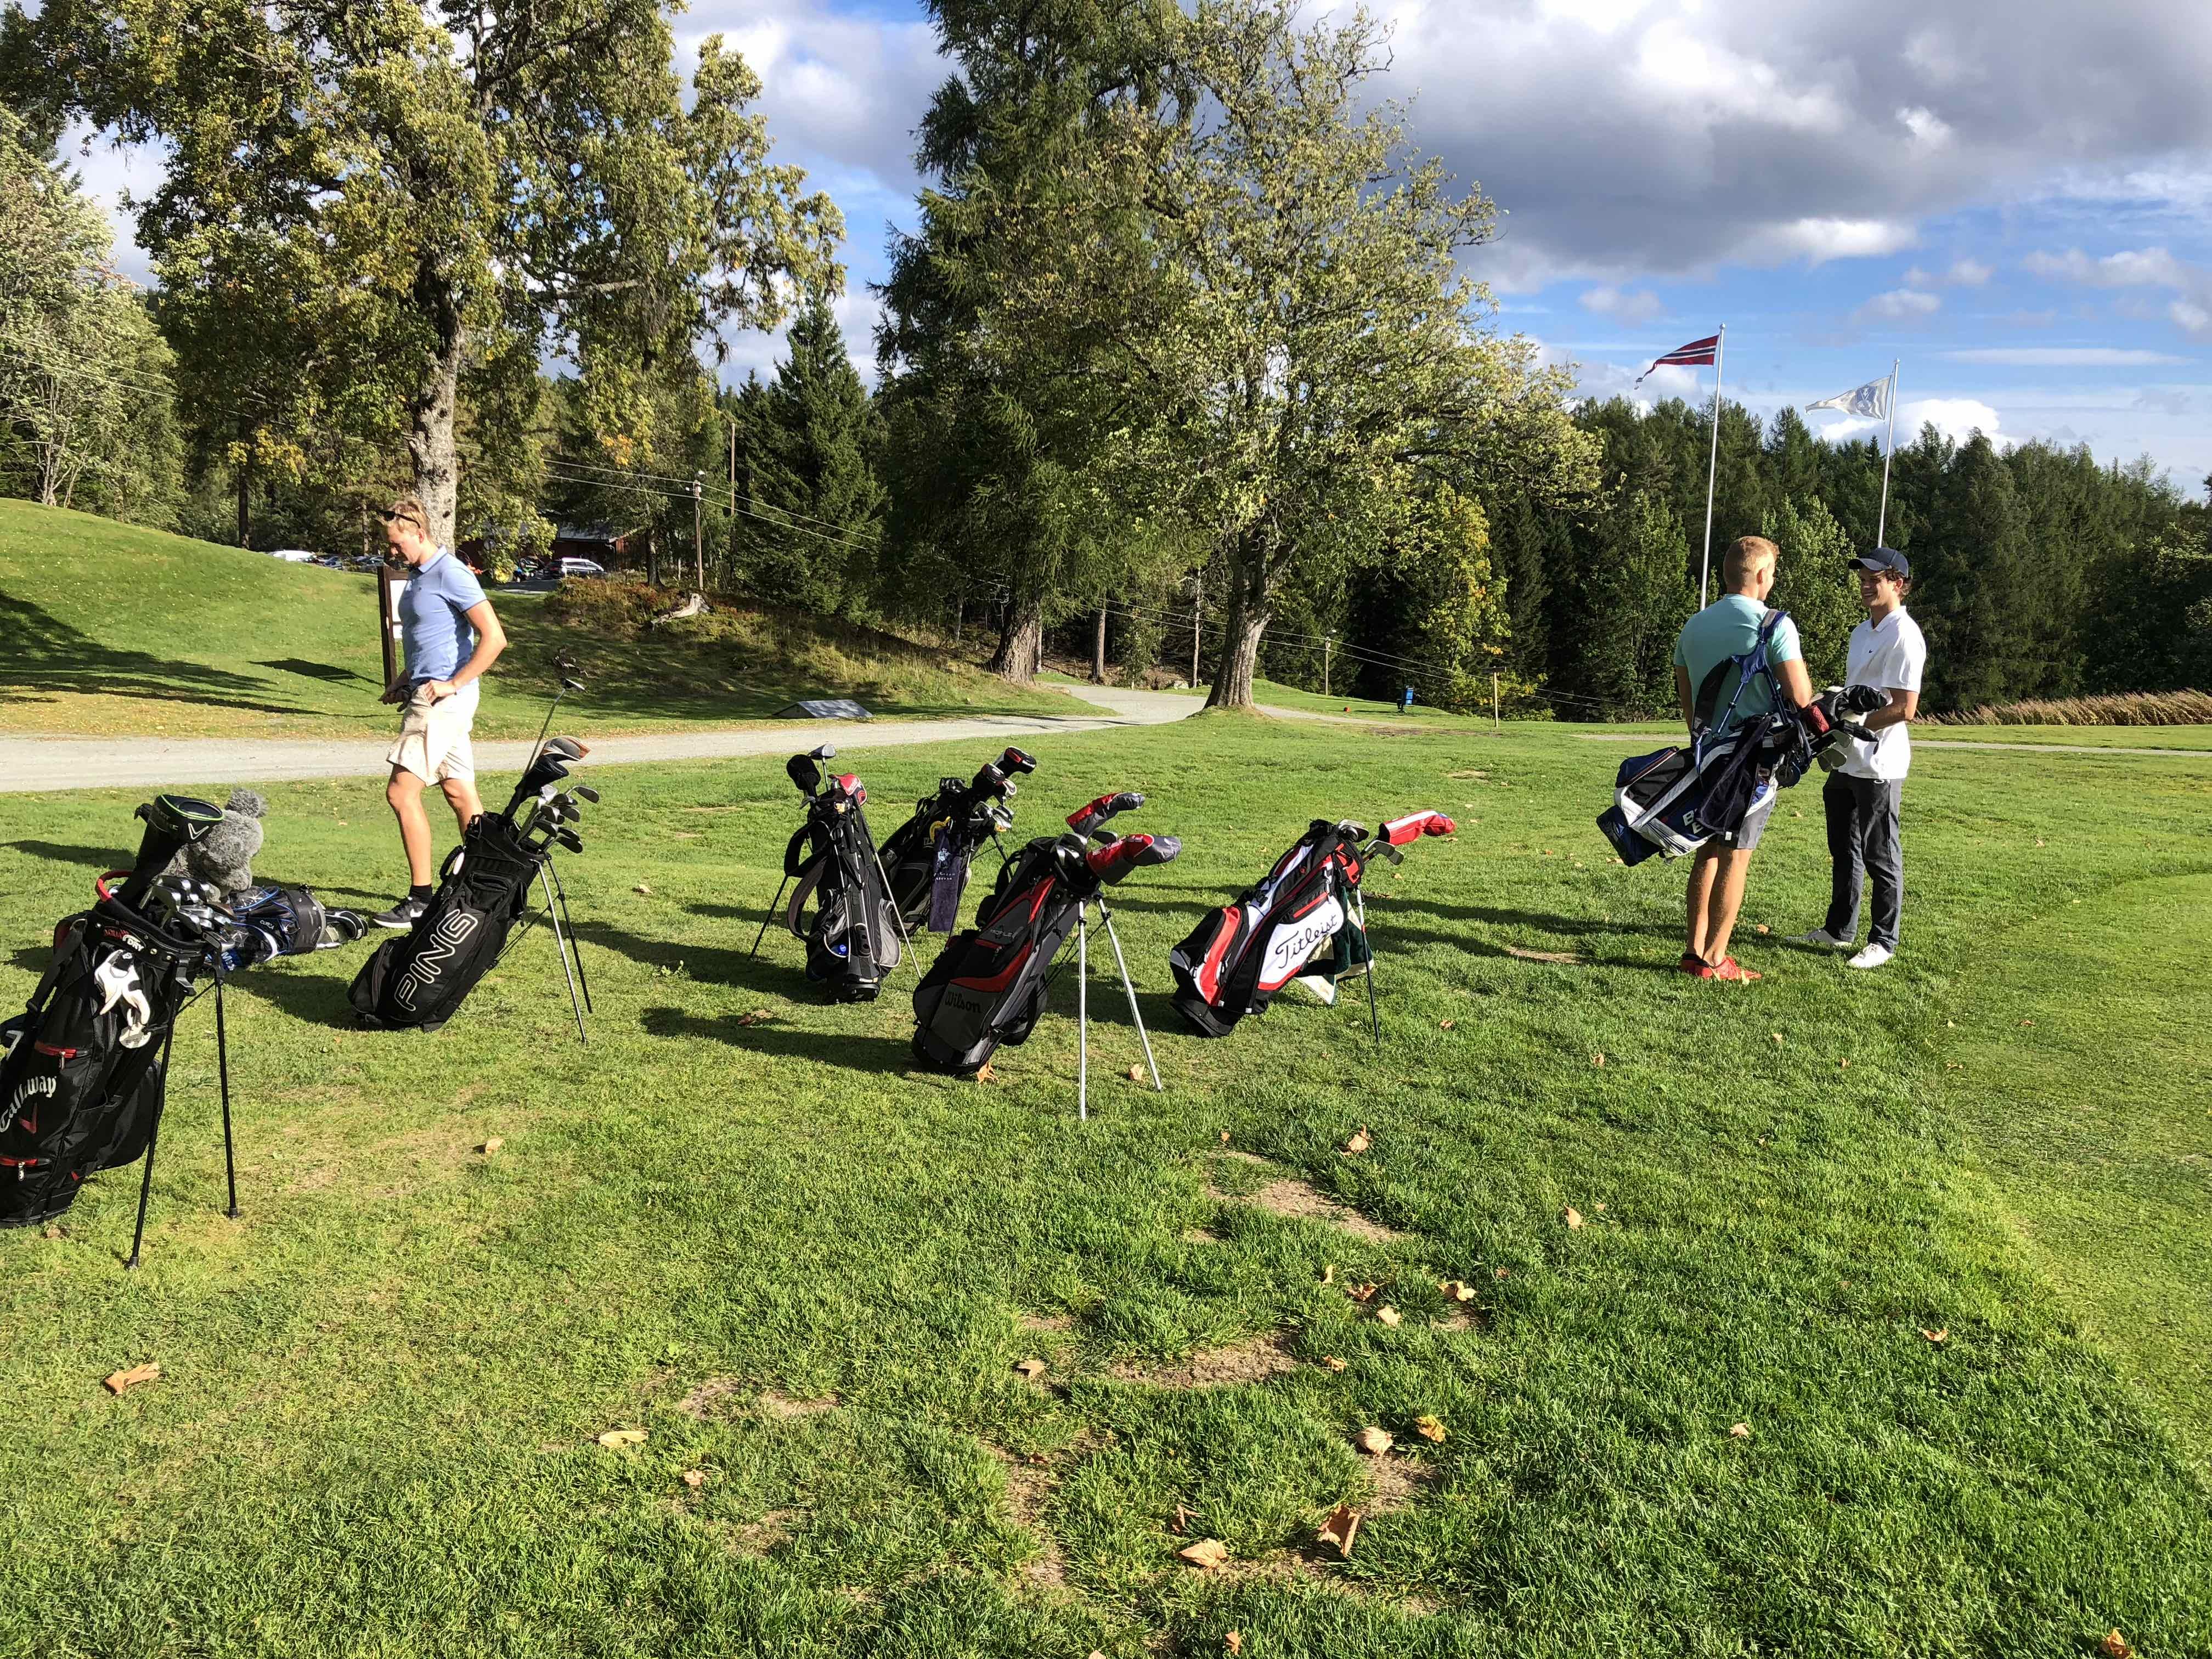 Trondheim Par3 Golf